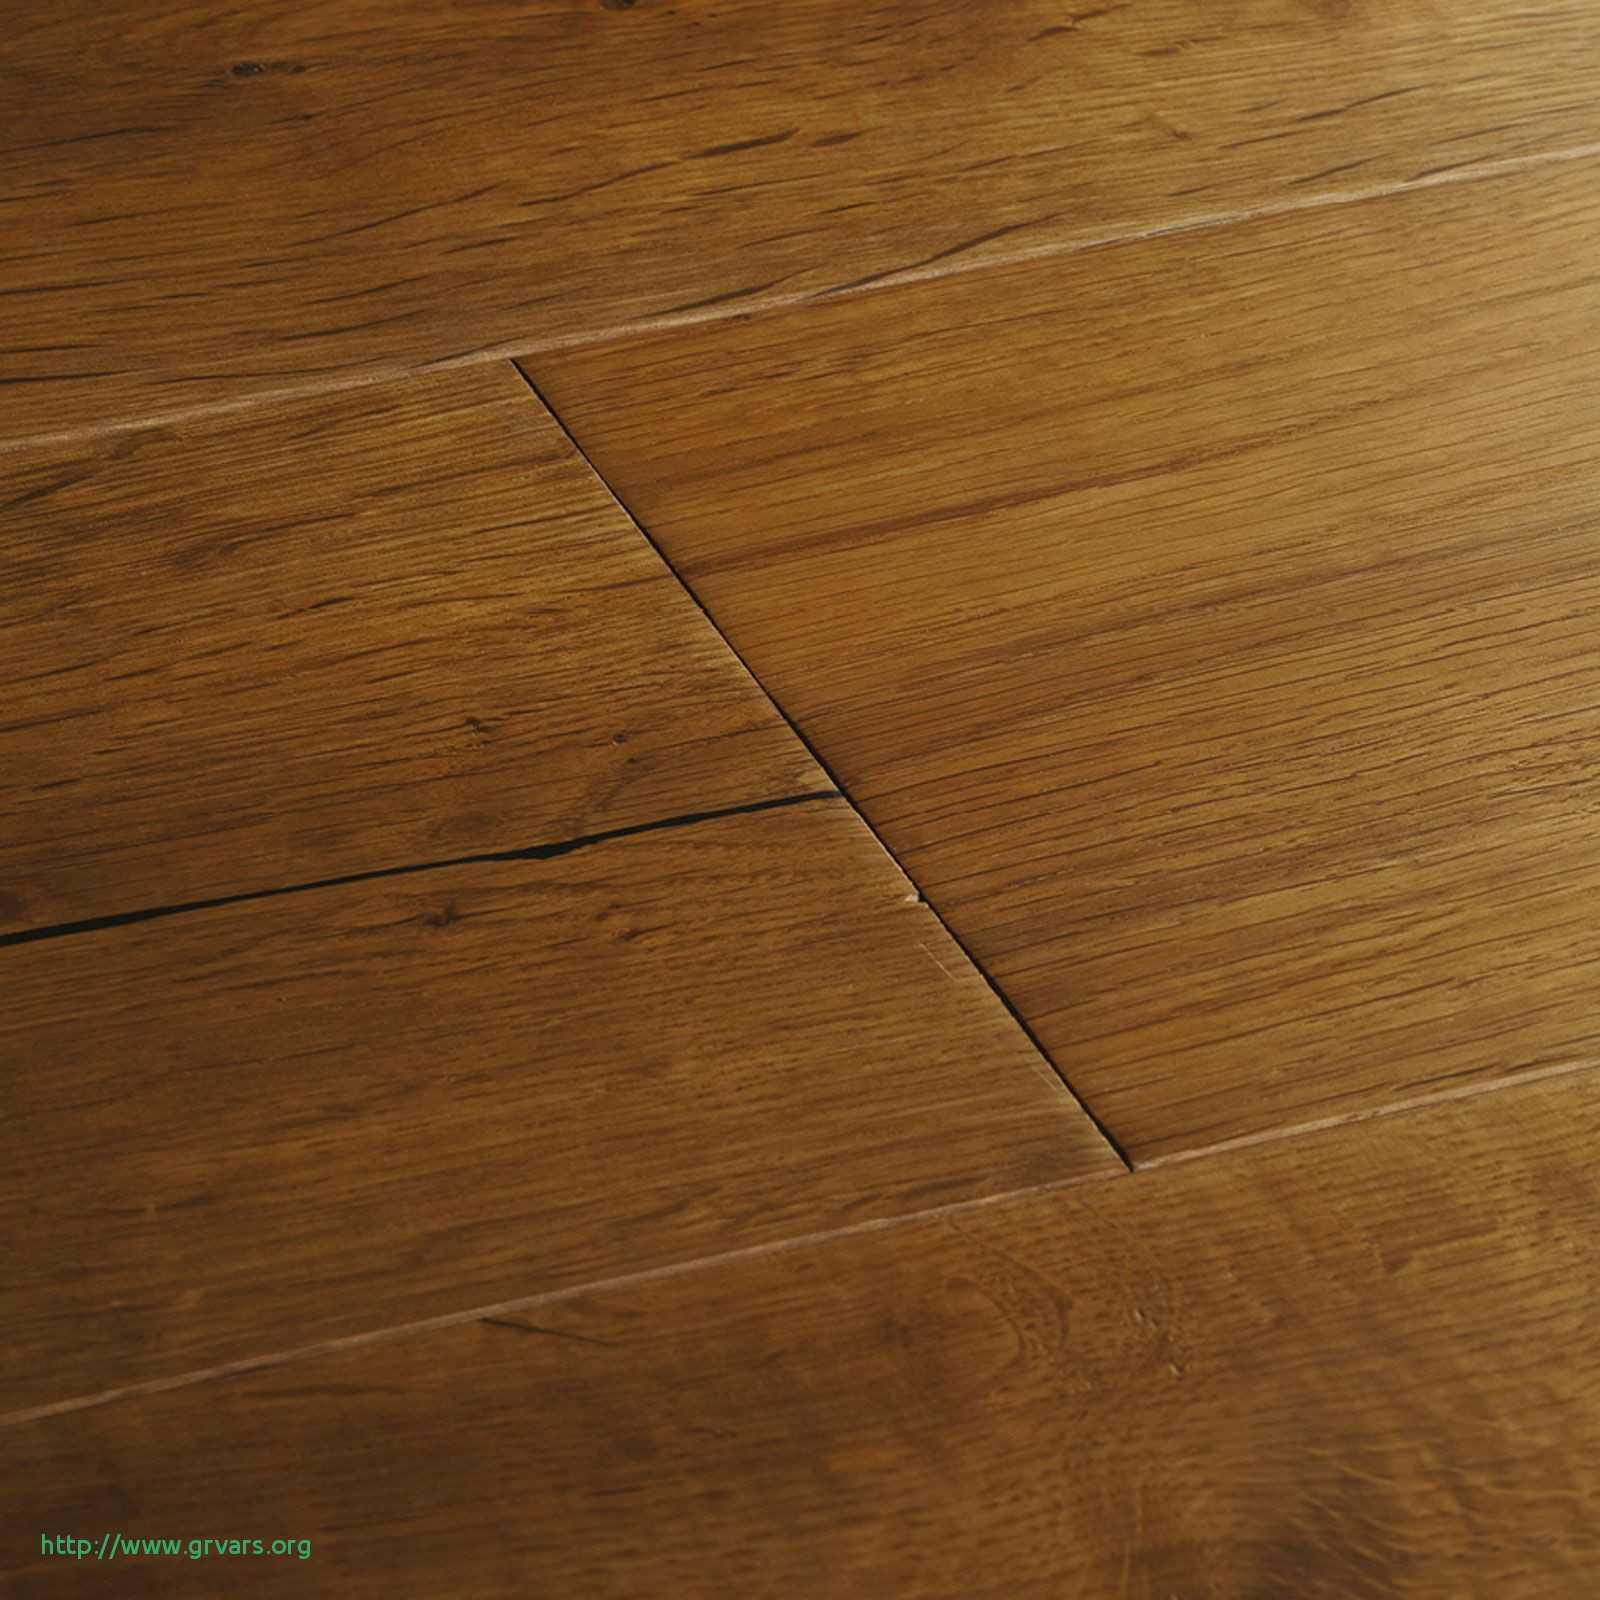 bq hardwood flooring of 22 impressionnant can laminate flooring be laid over tiles ideas blog intended for can laminate flooring be laid over tiles charmant laying laminate flooring can you lay laminate flooring